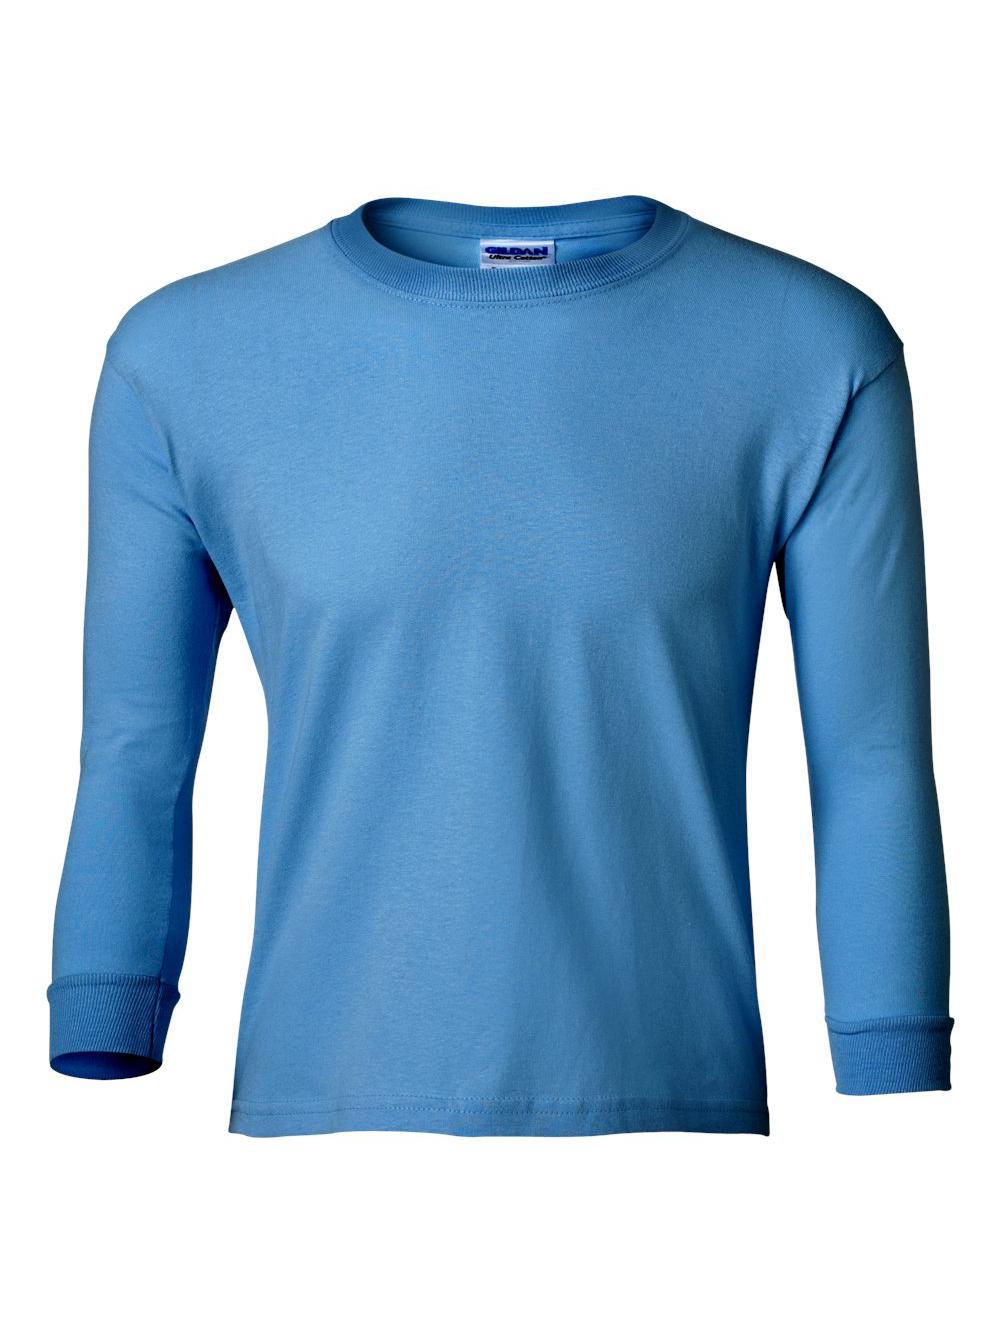 Gildan-Ultra-Cotton-Youth-Long-Sleeve-T-Shirt-2400B thumbnail 39